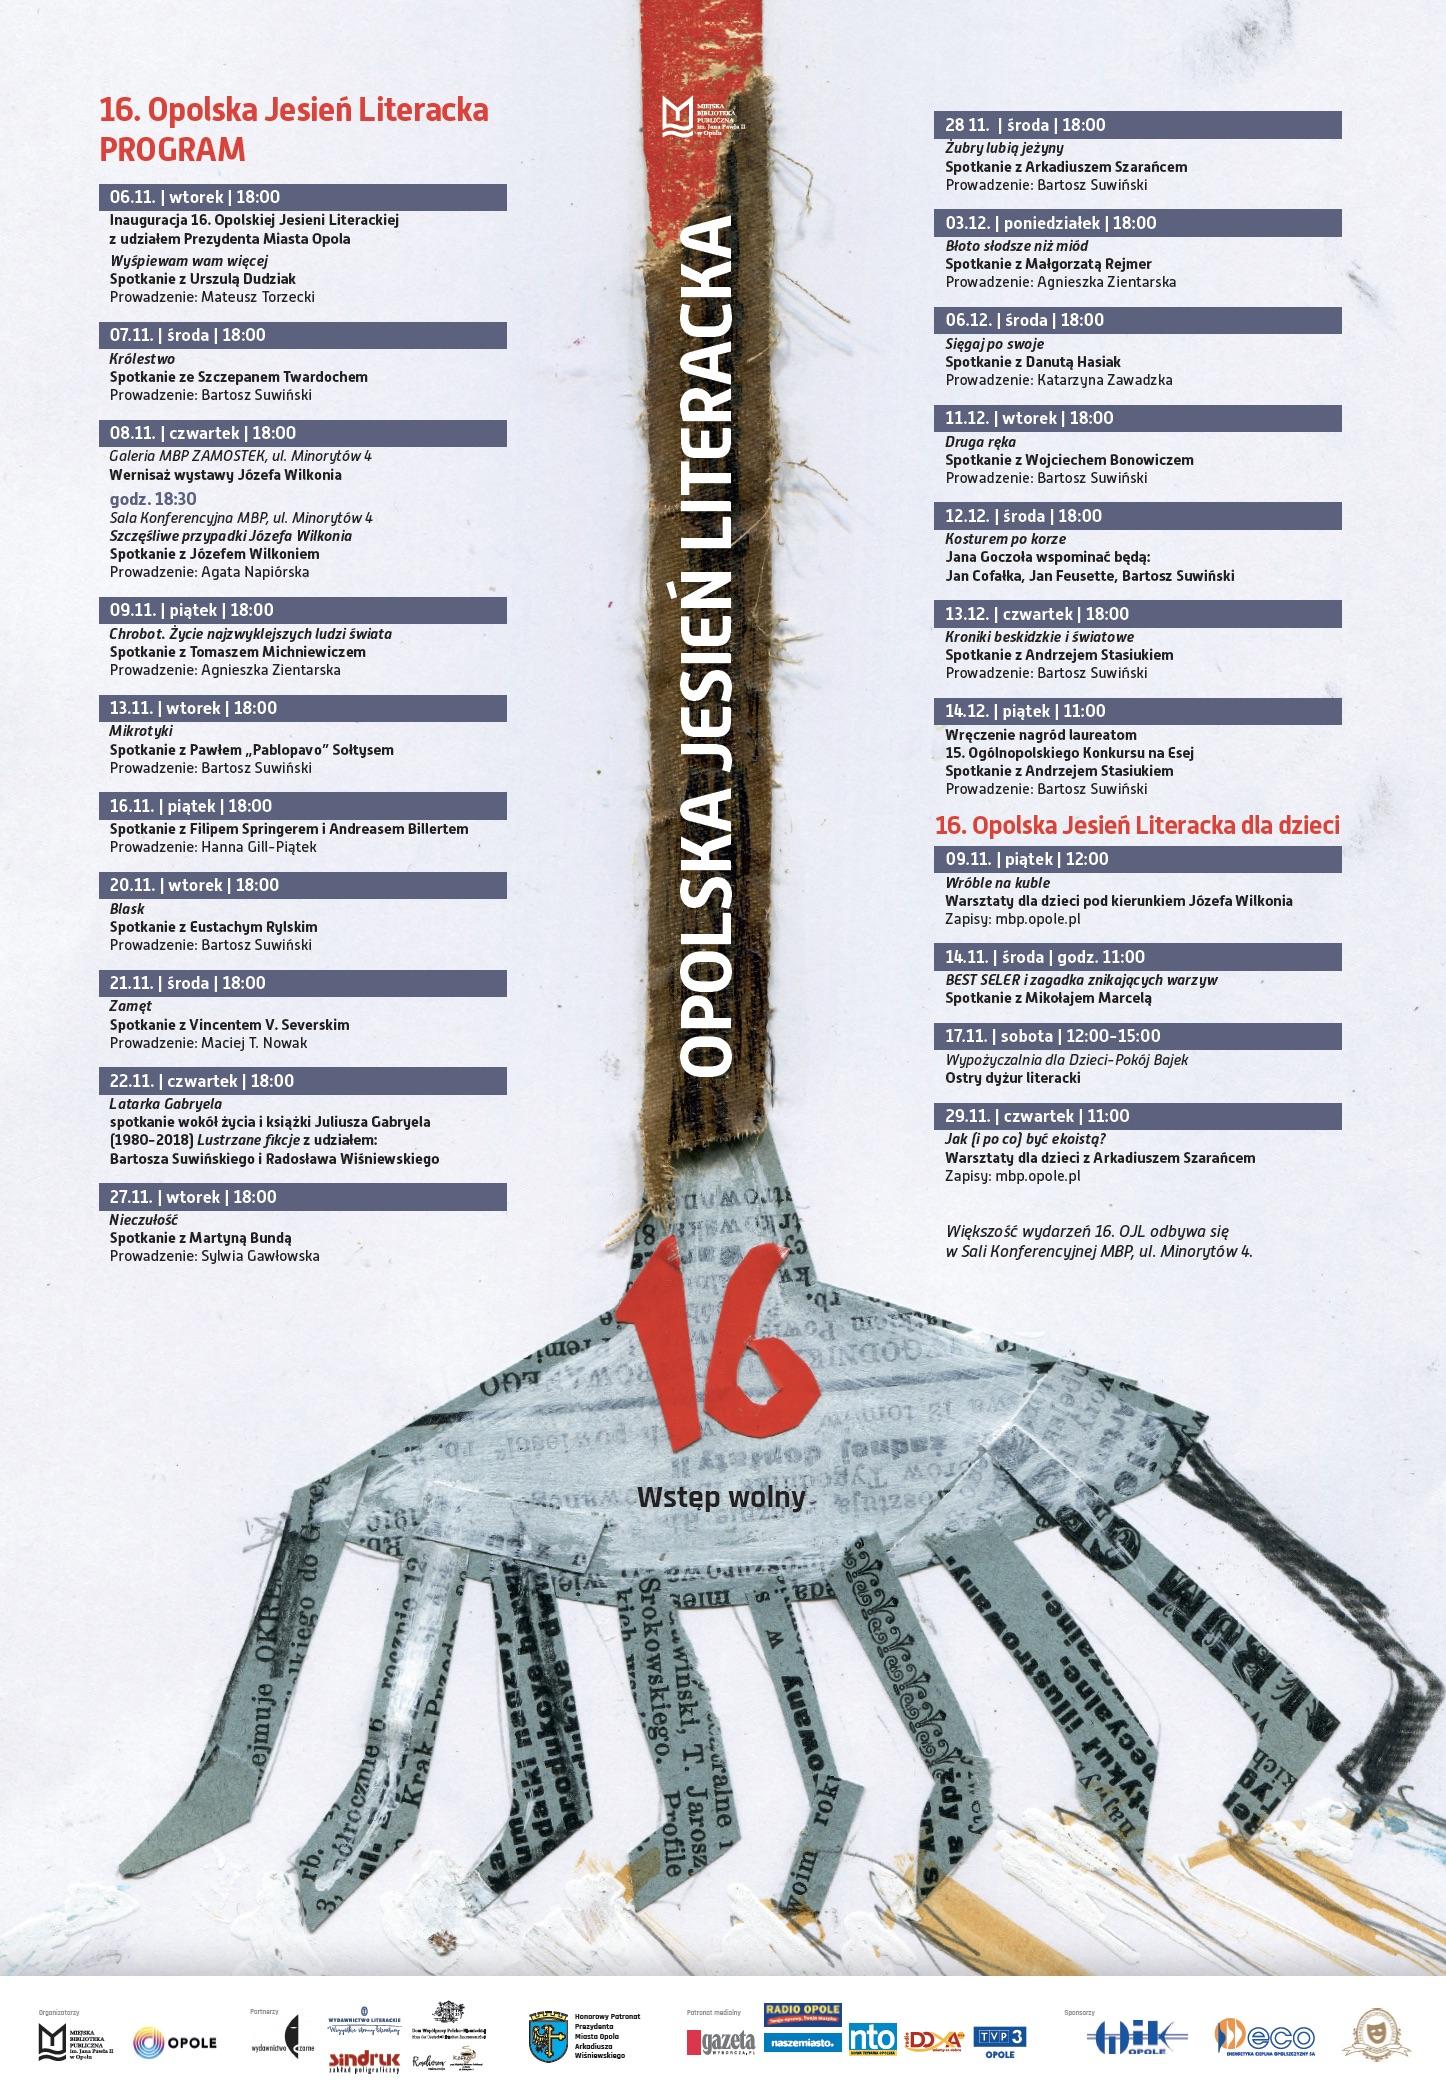 16. Opolska Jesień Literacka